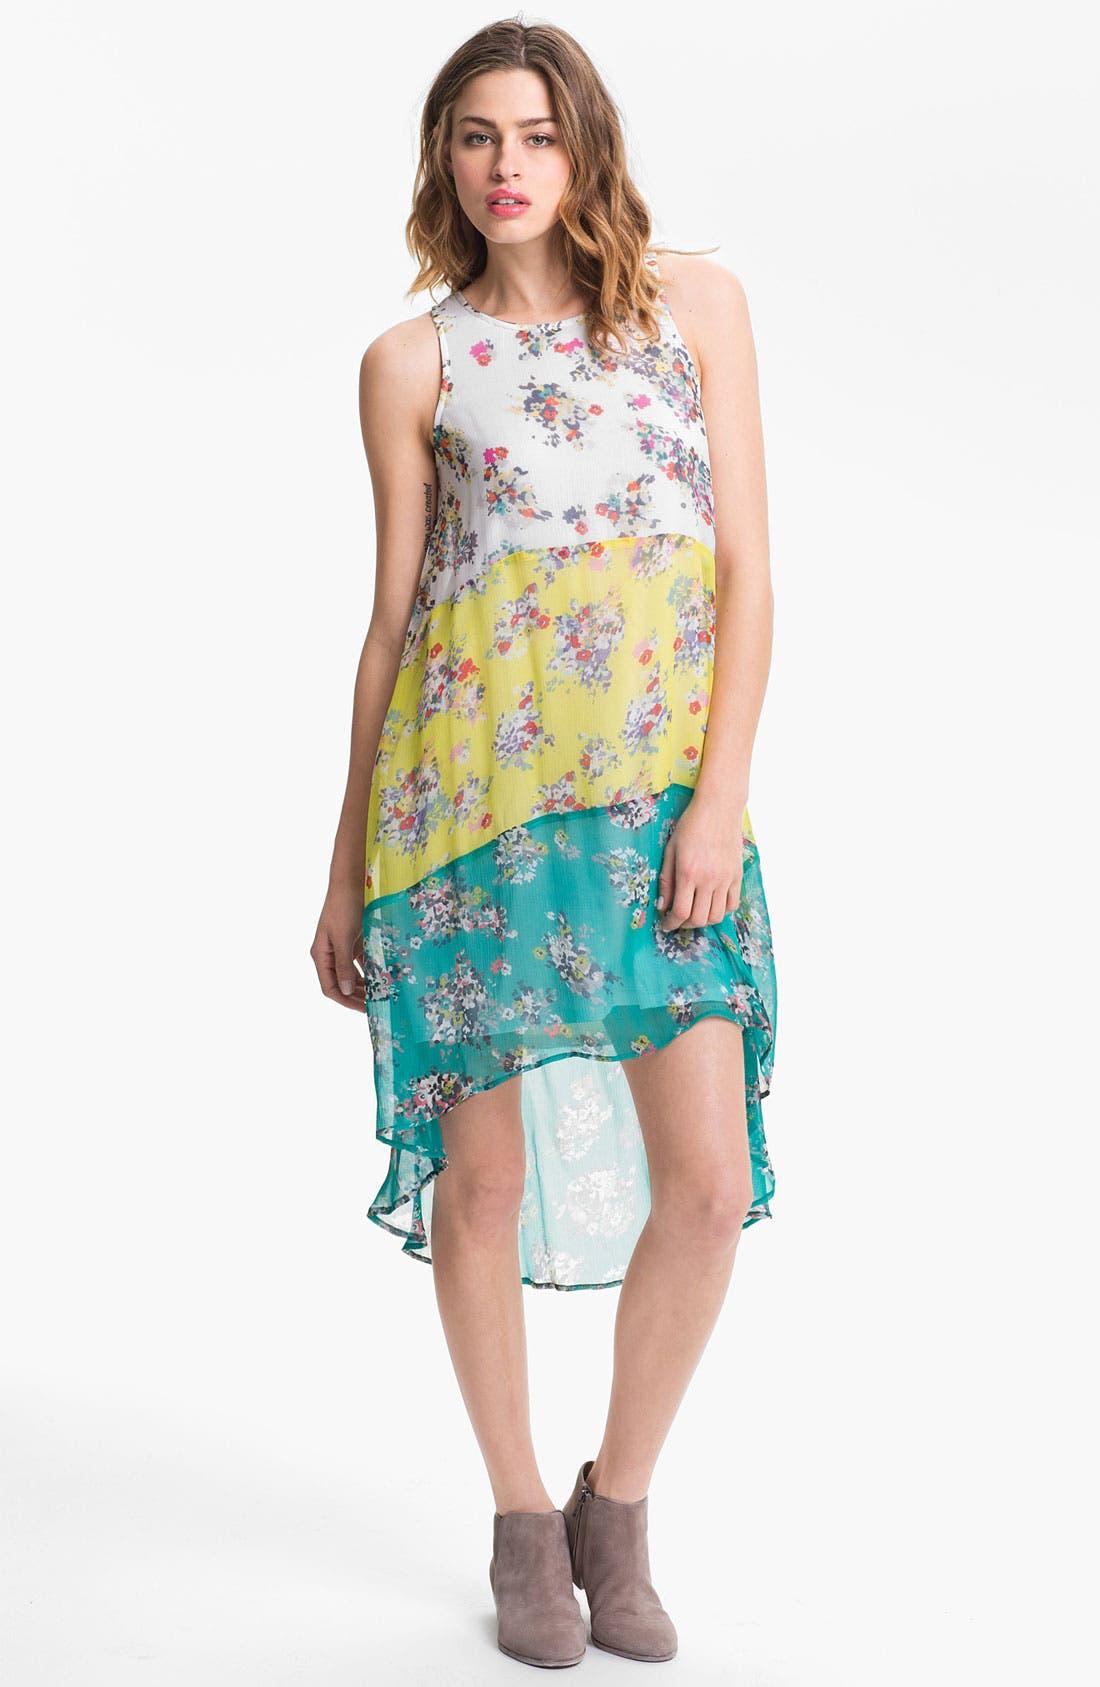 Alternate Image 1 Selected - Ella Moss 'Citrus' Mixed Print Tiered Chiffon Dress